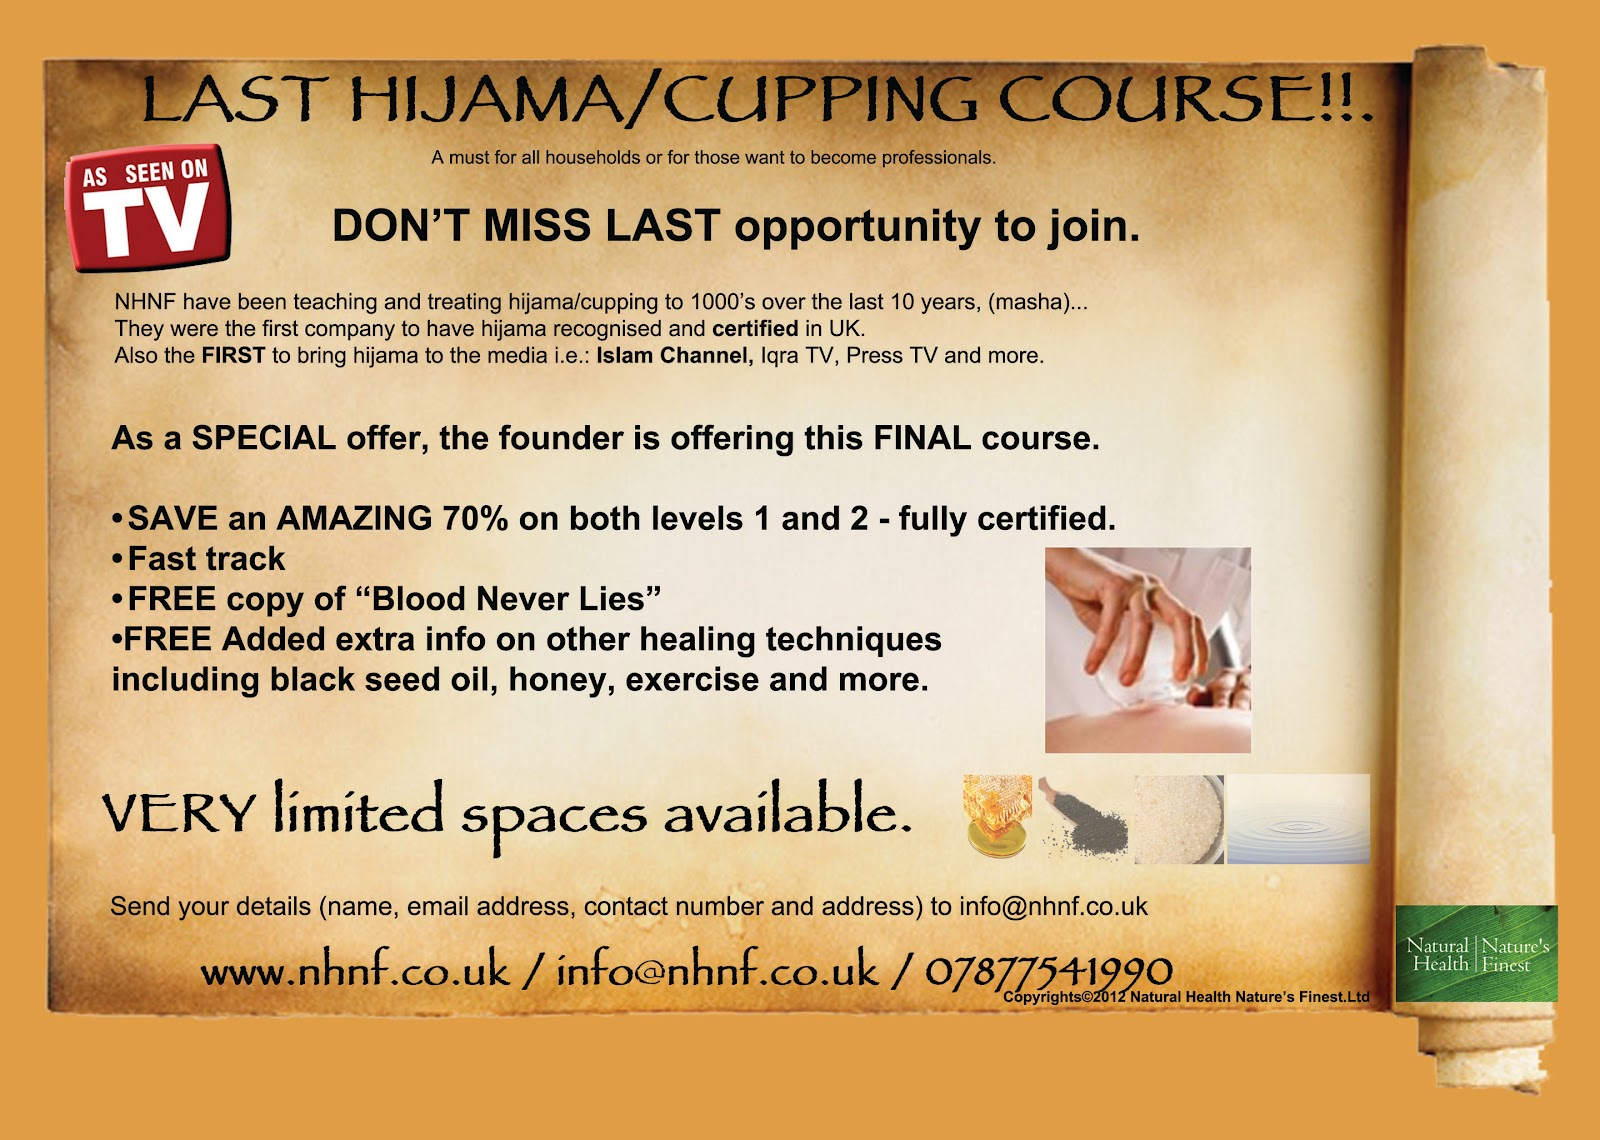 Ahealth: Hijama course by NHNF